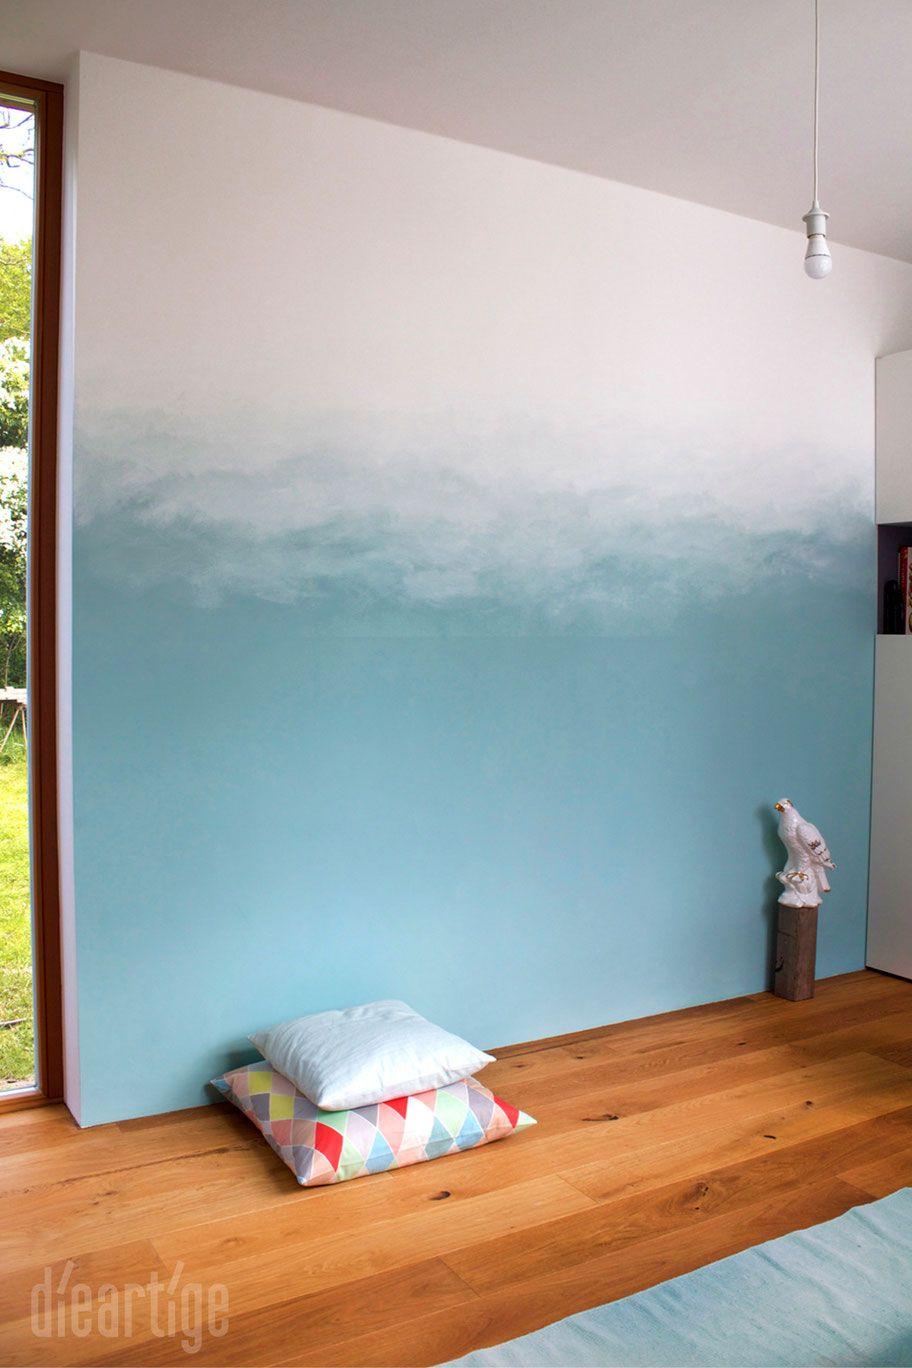 Dieartigeblog Wandgestaltung Raumgestaltung Farbgestaltung Farbverlauf Wandgestaltung Wandgestaltung Kinderzimmer Farbgestaltung